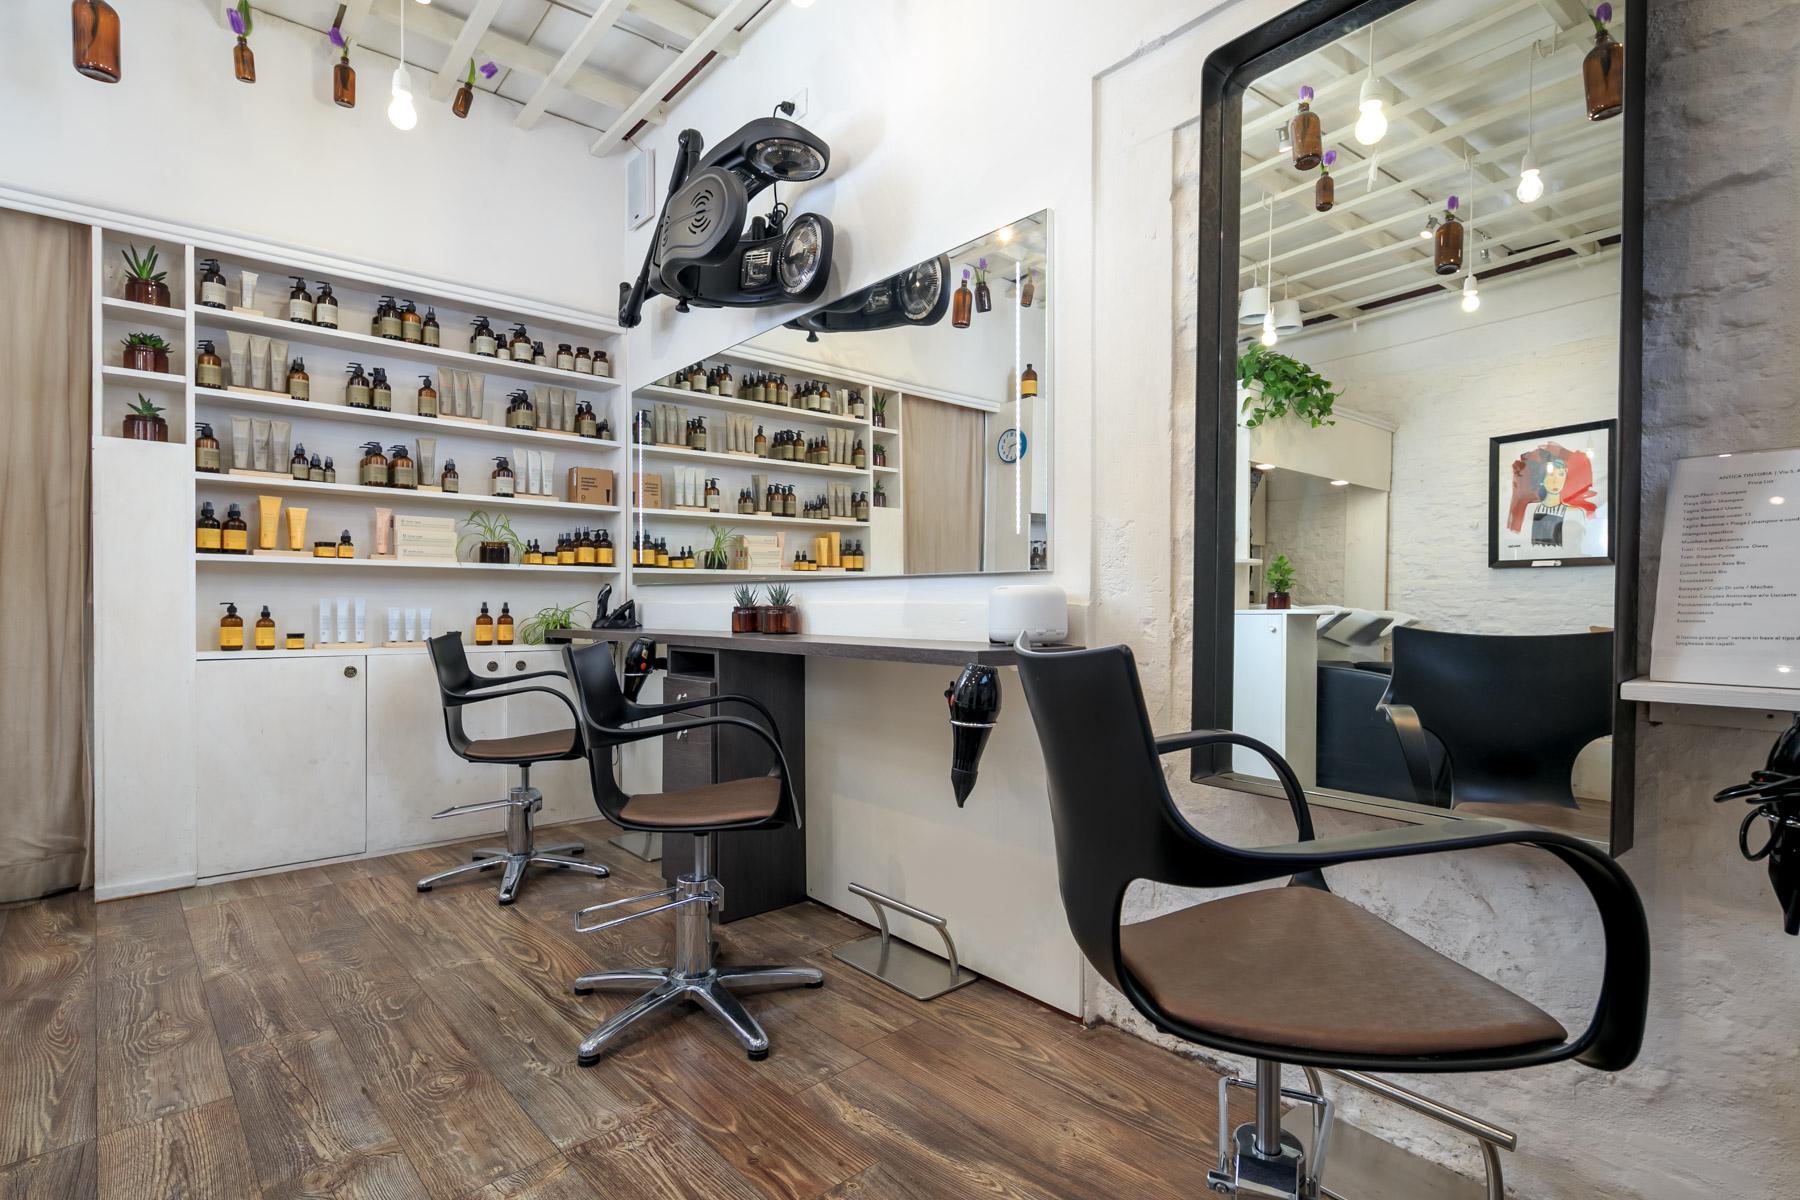 interni parrucchiere antica tintoria santo spirito